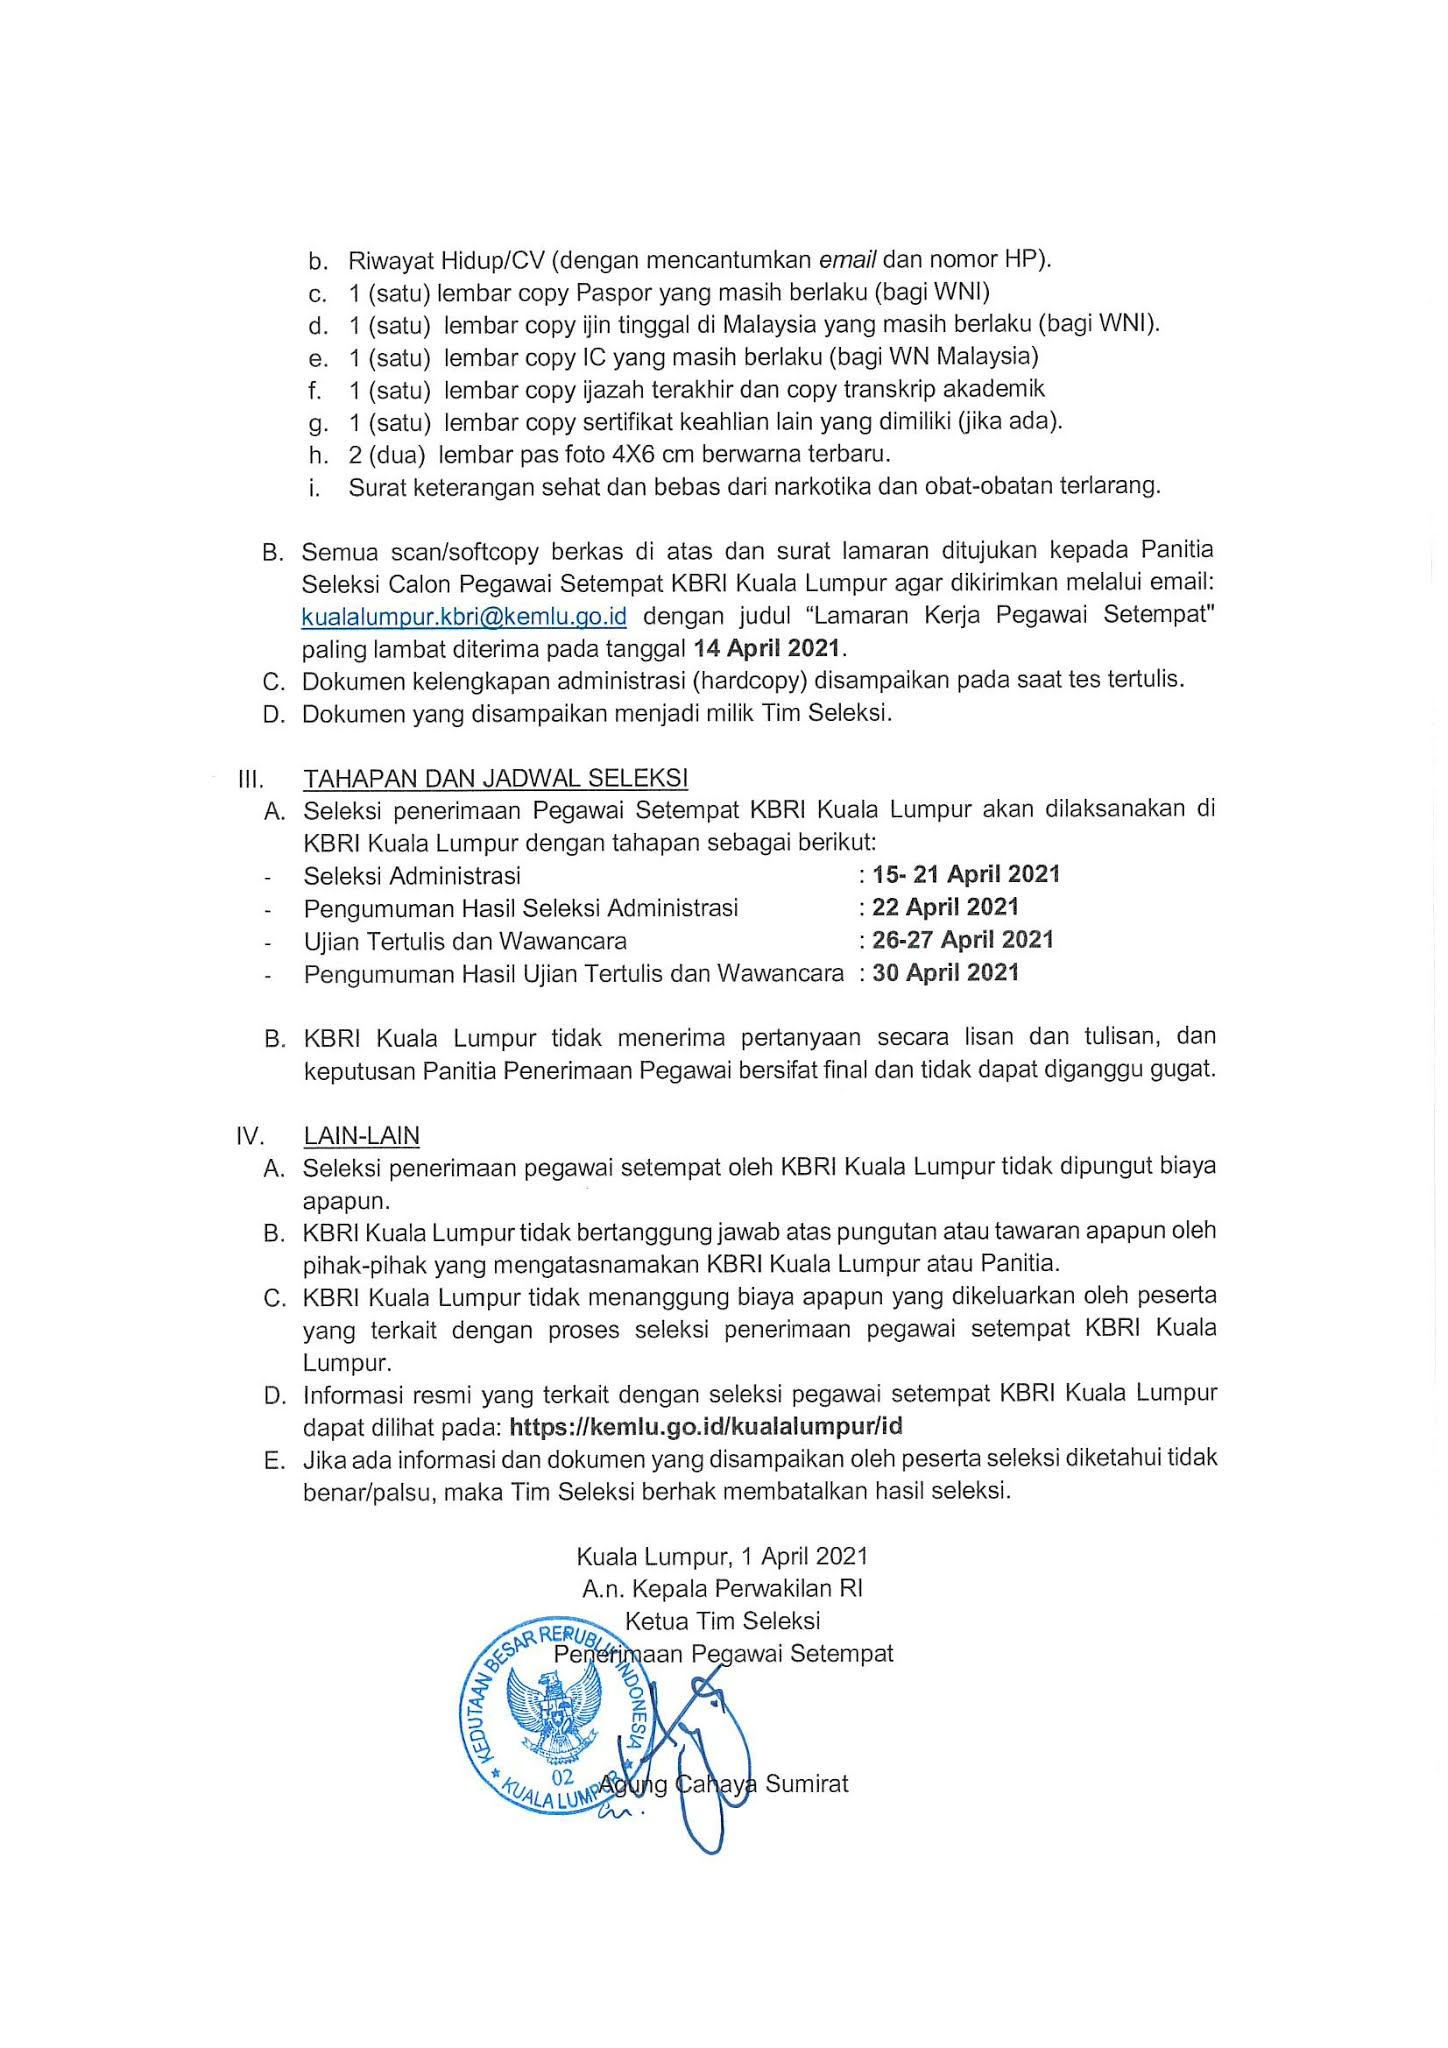 Seleksi Penerimaan Pegawai KBRI Kuala Lumpur